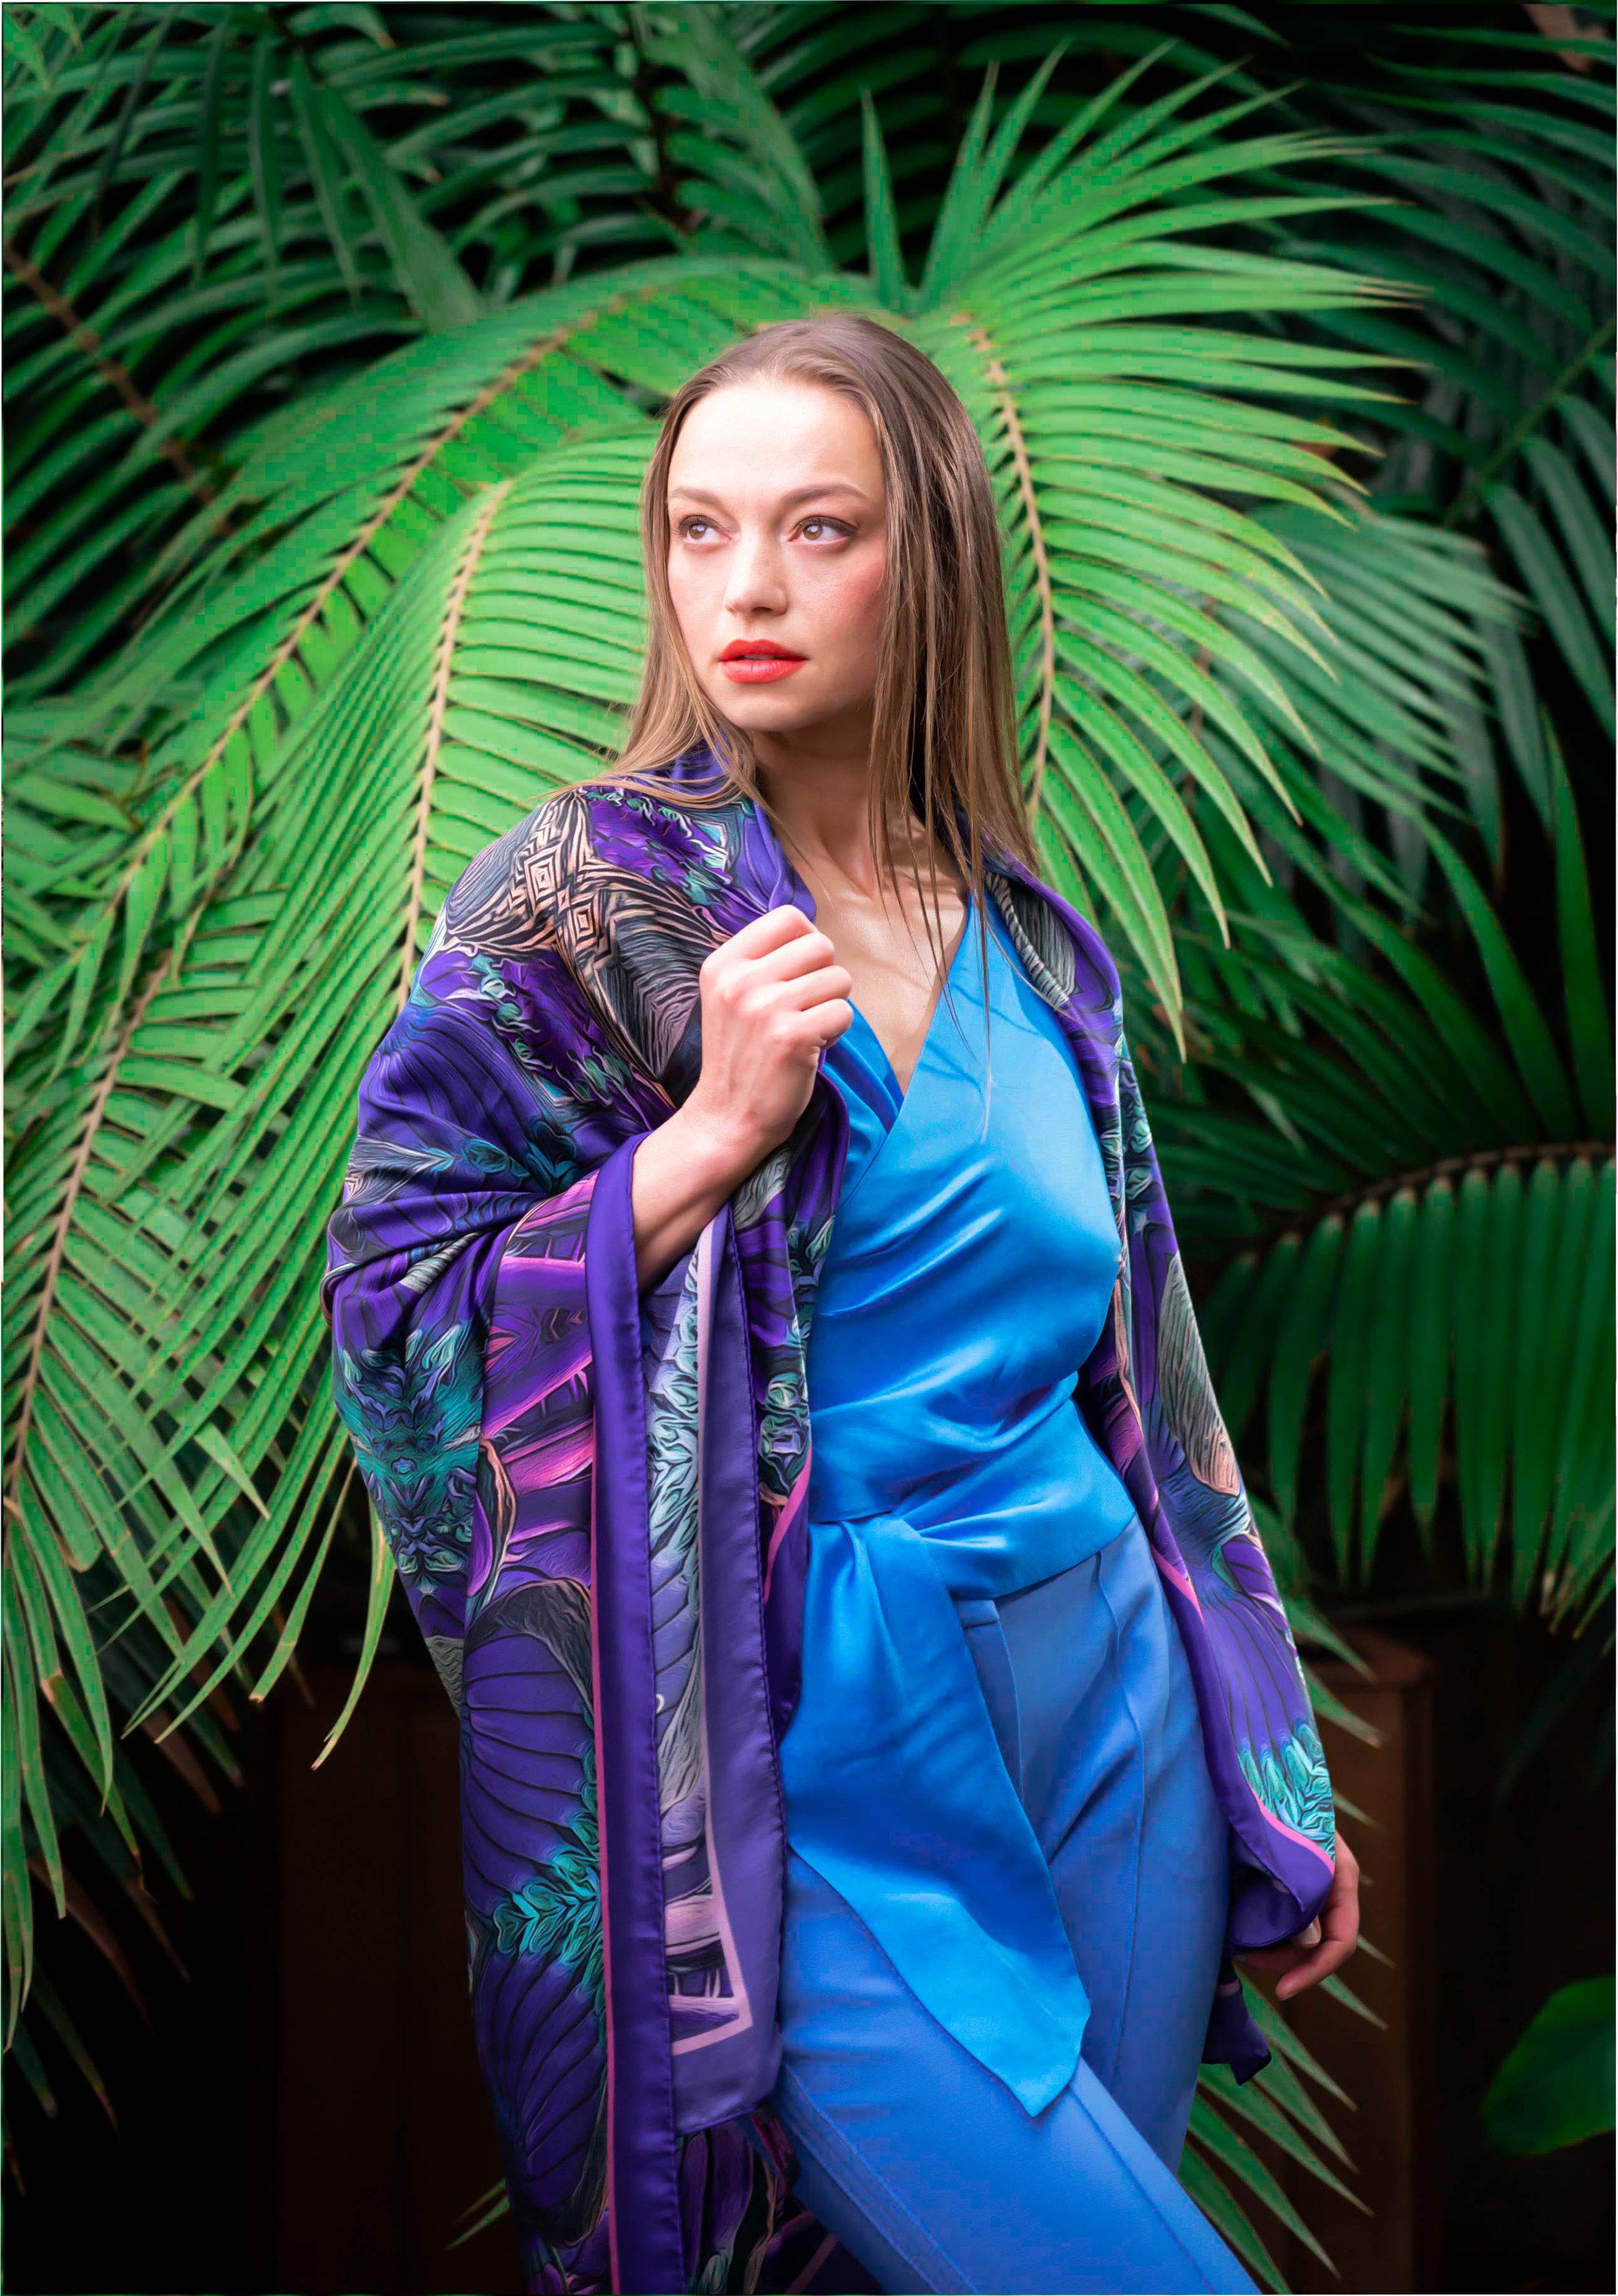 Bunches of bananas purple silk scarf